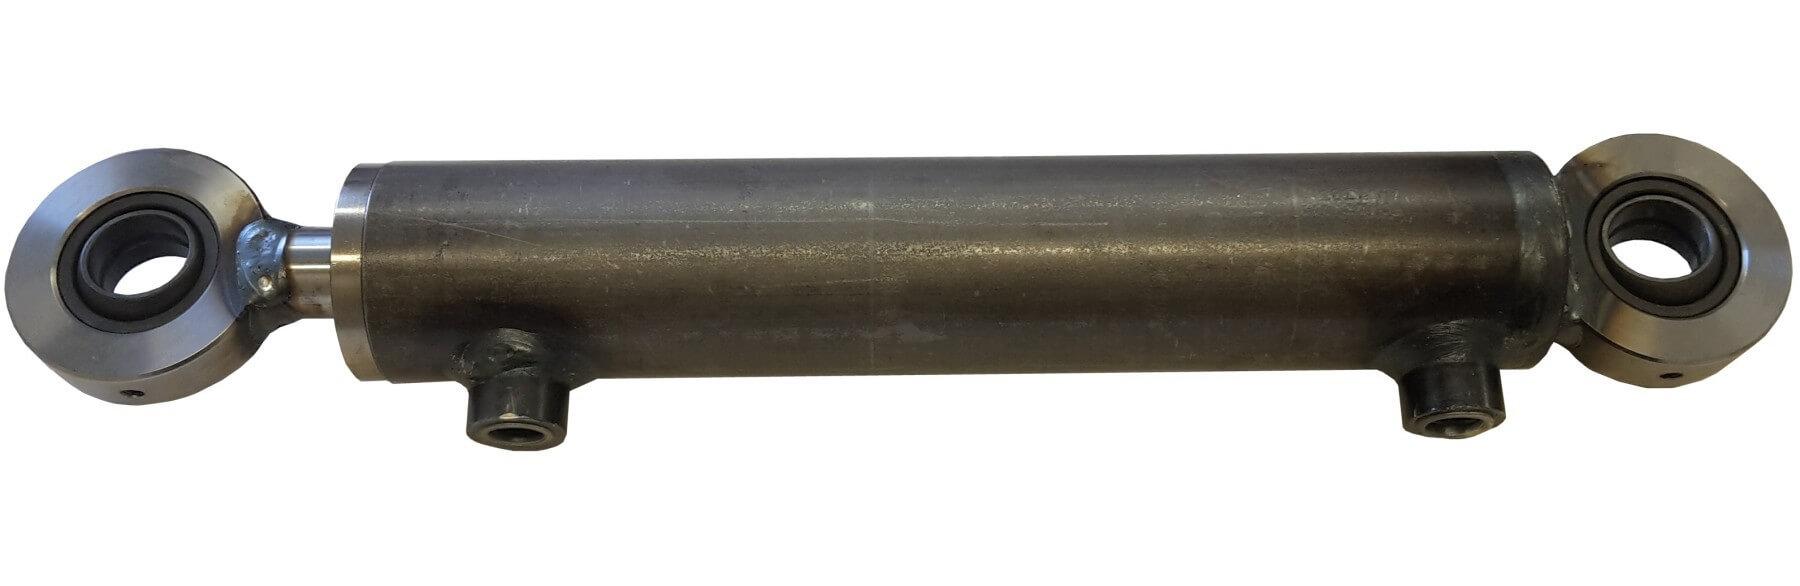 Hydraulisylinteri CL 50. 30. 600 GE